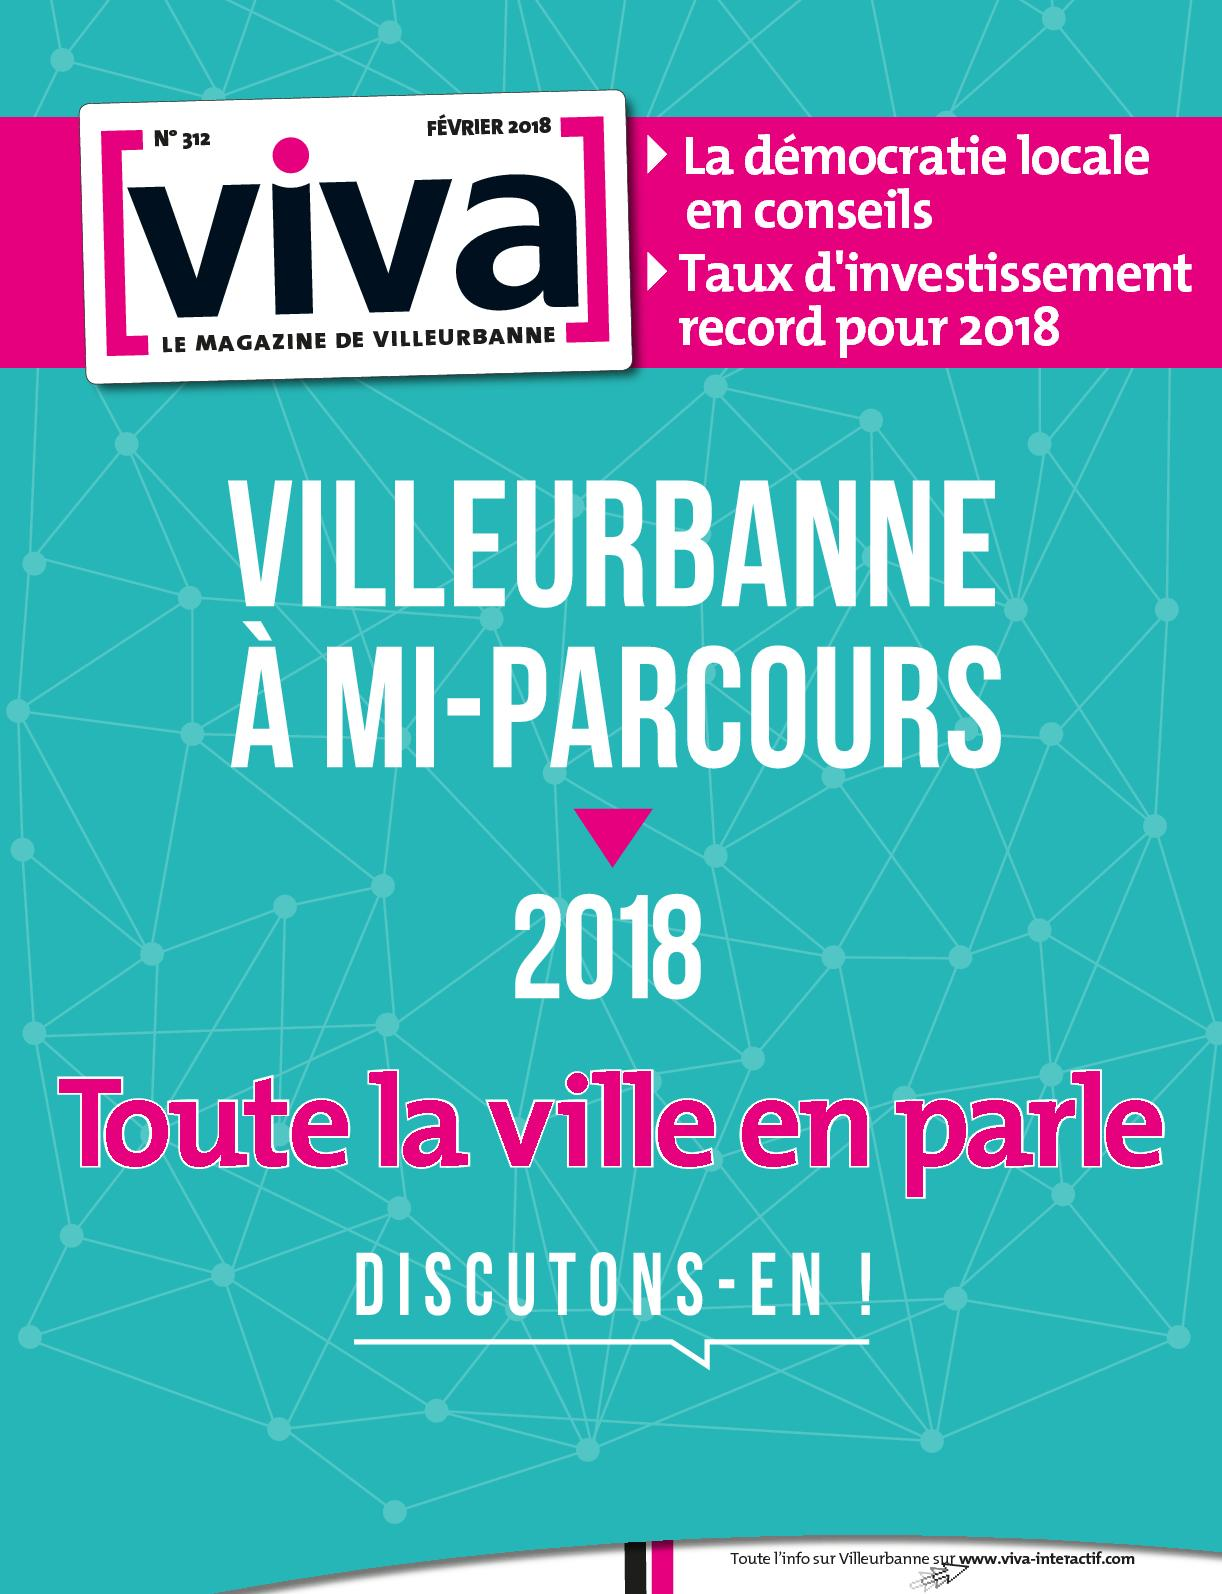 Calaméo - Viva février 2018 eb3b0d4425b3